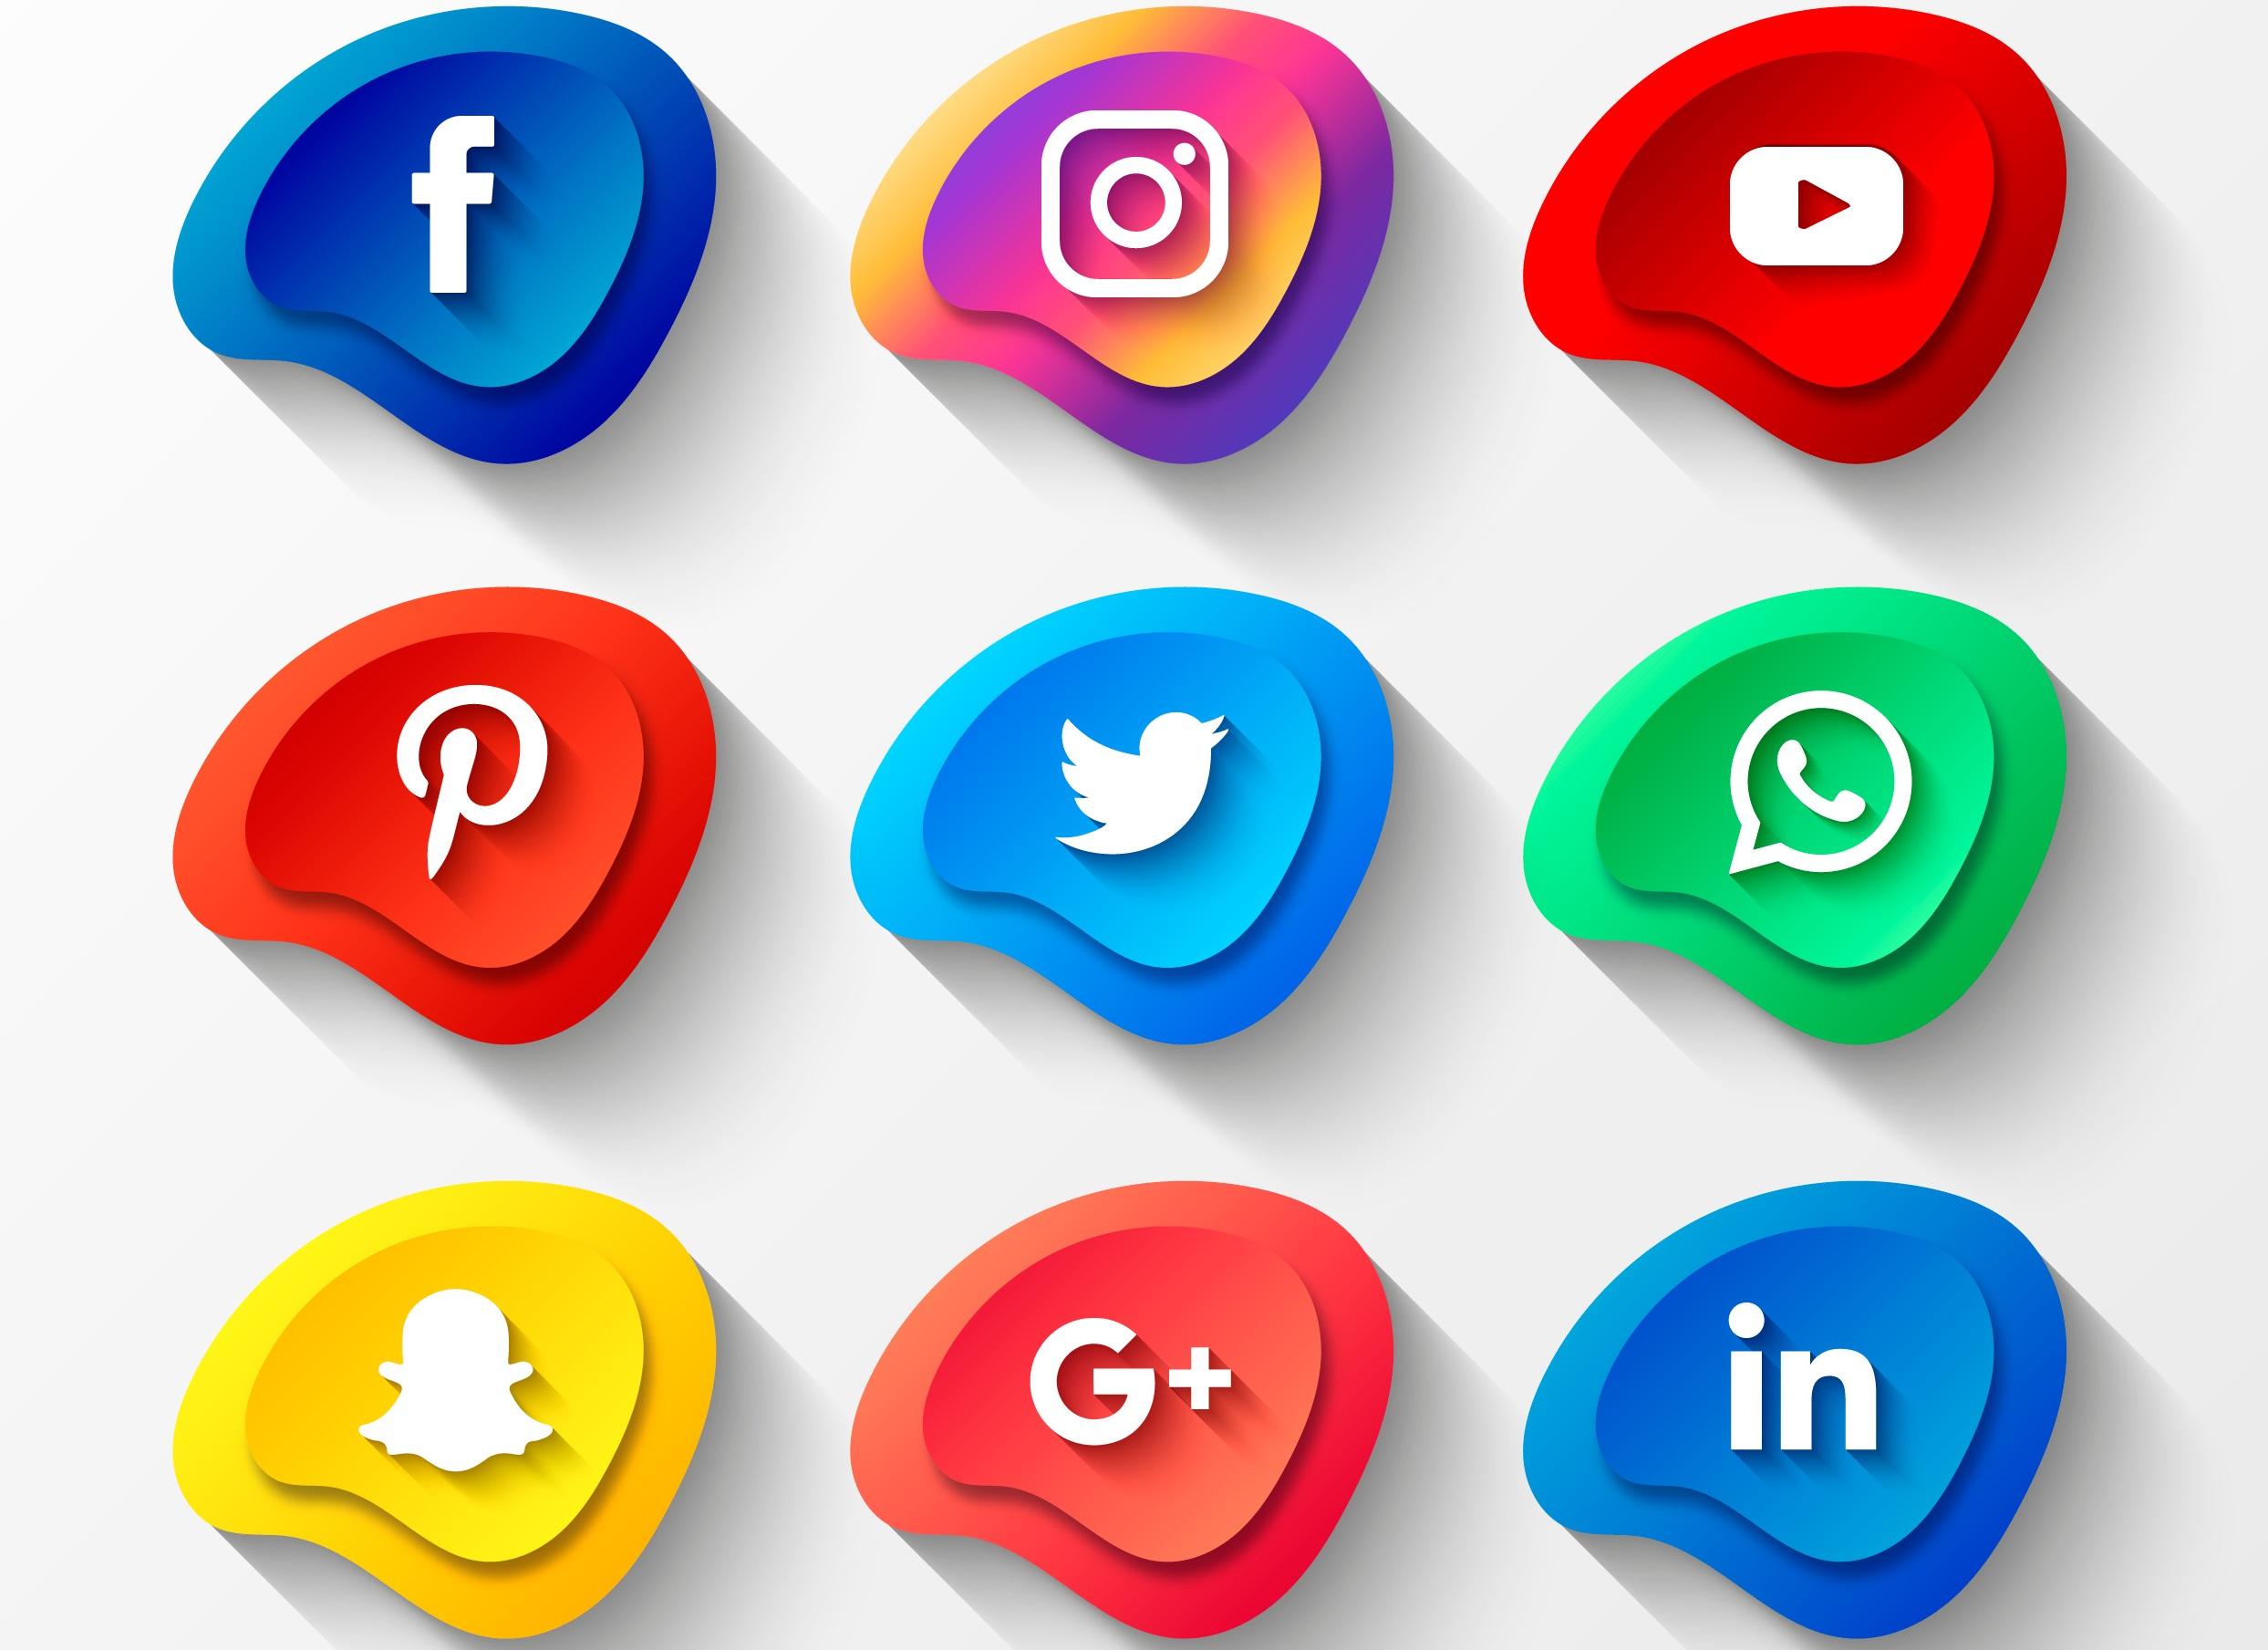 social media icons gather testimonials from social media